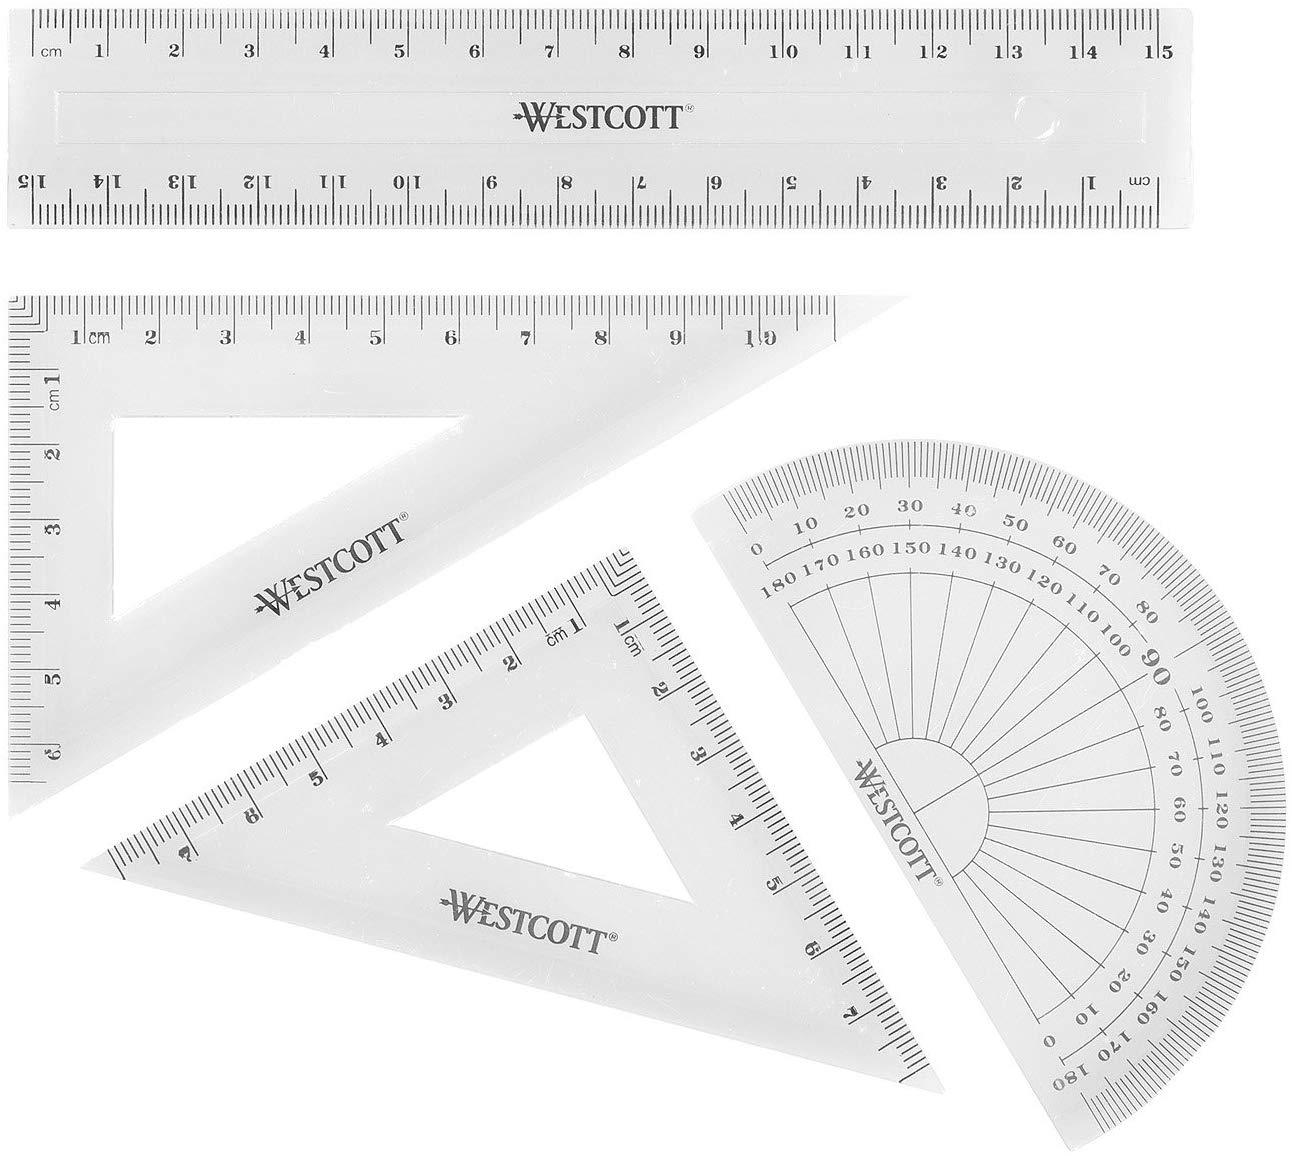 Westcott E-10303 00 Math Set - Transparent (Pack of 4) 79p (Prime) £5.28 (Non Prime) at Amazon